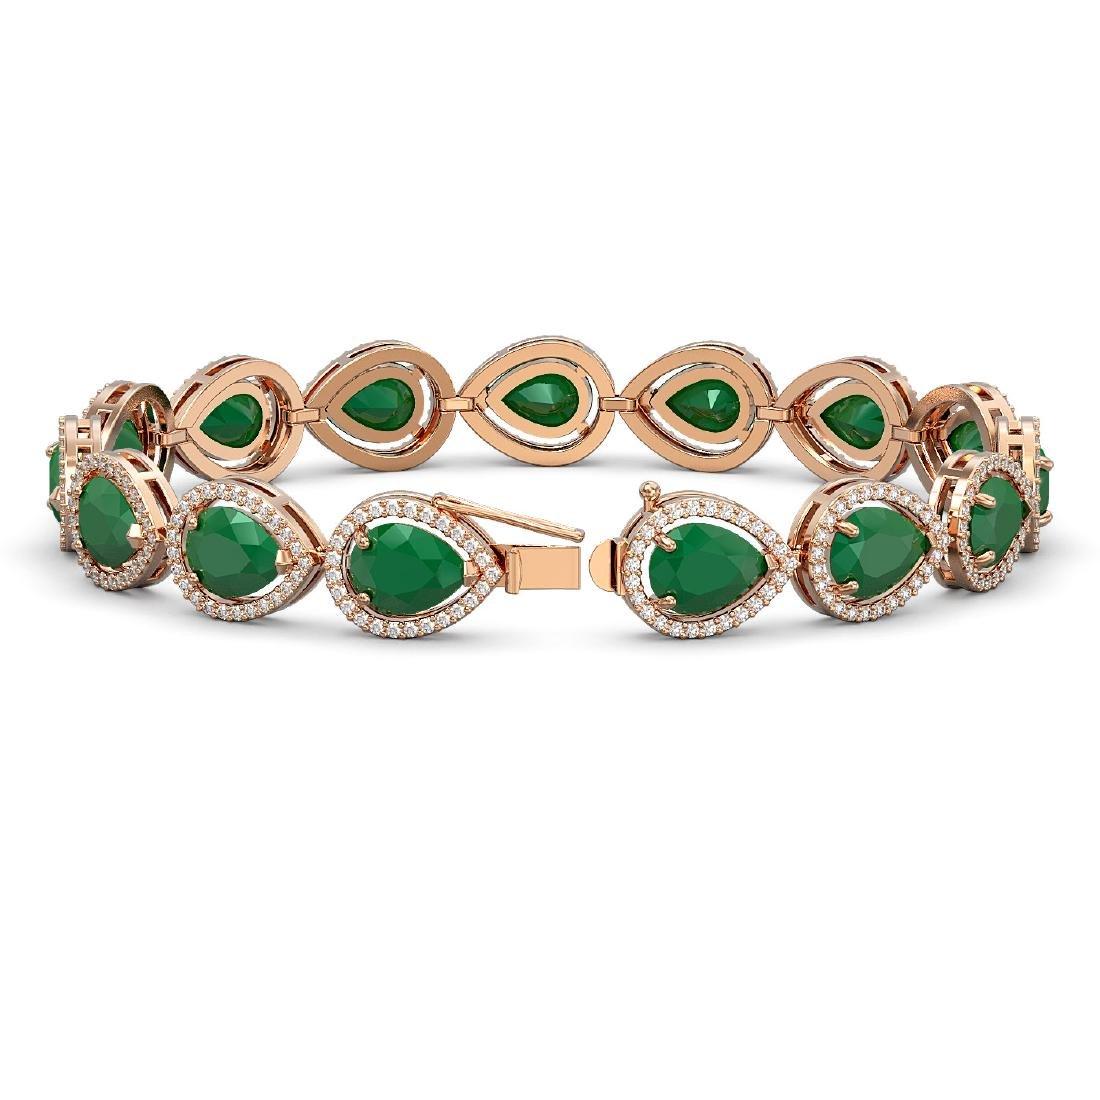 30.06 CTW Emerald & Diamond Halo Bracelet 10K Rose Gold - 2